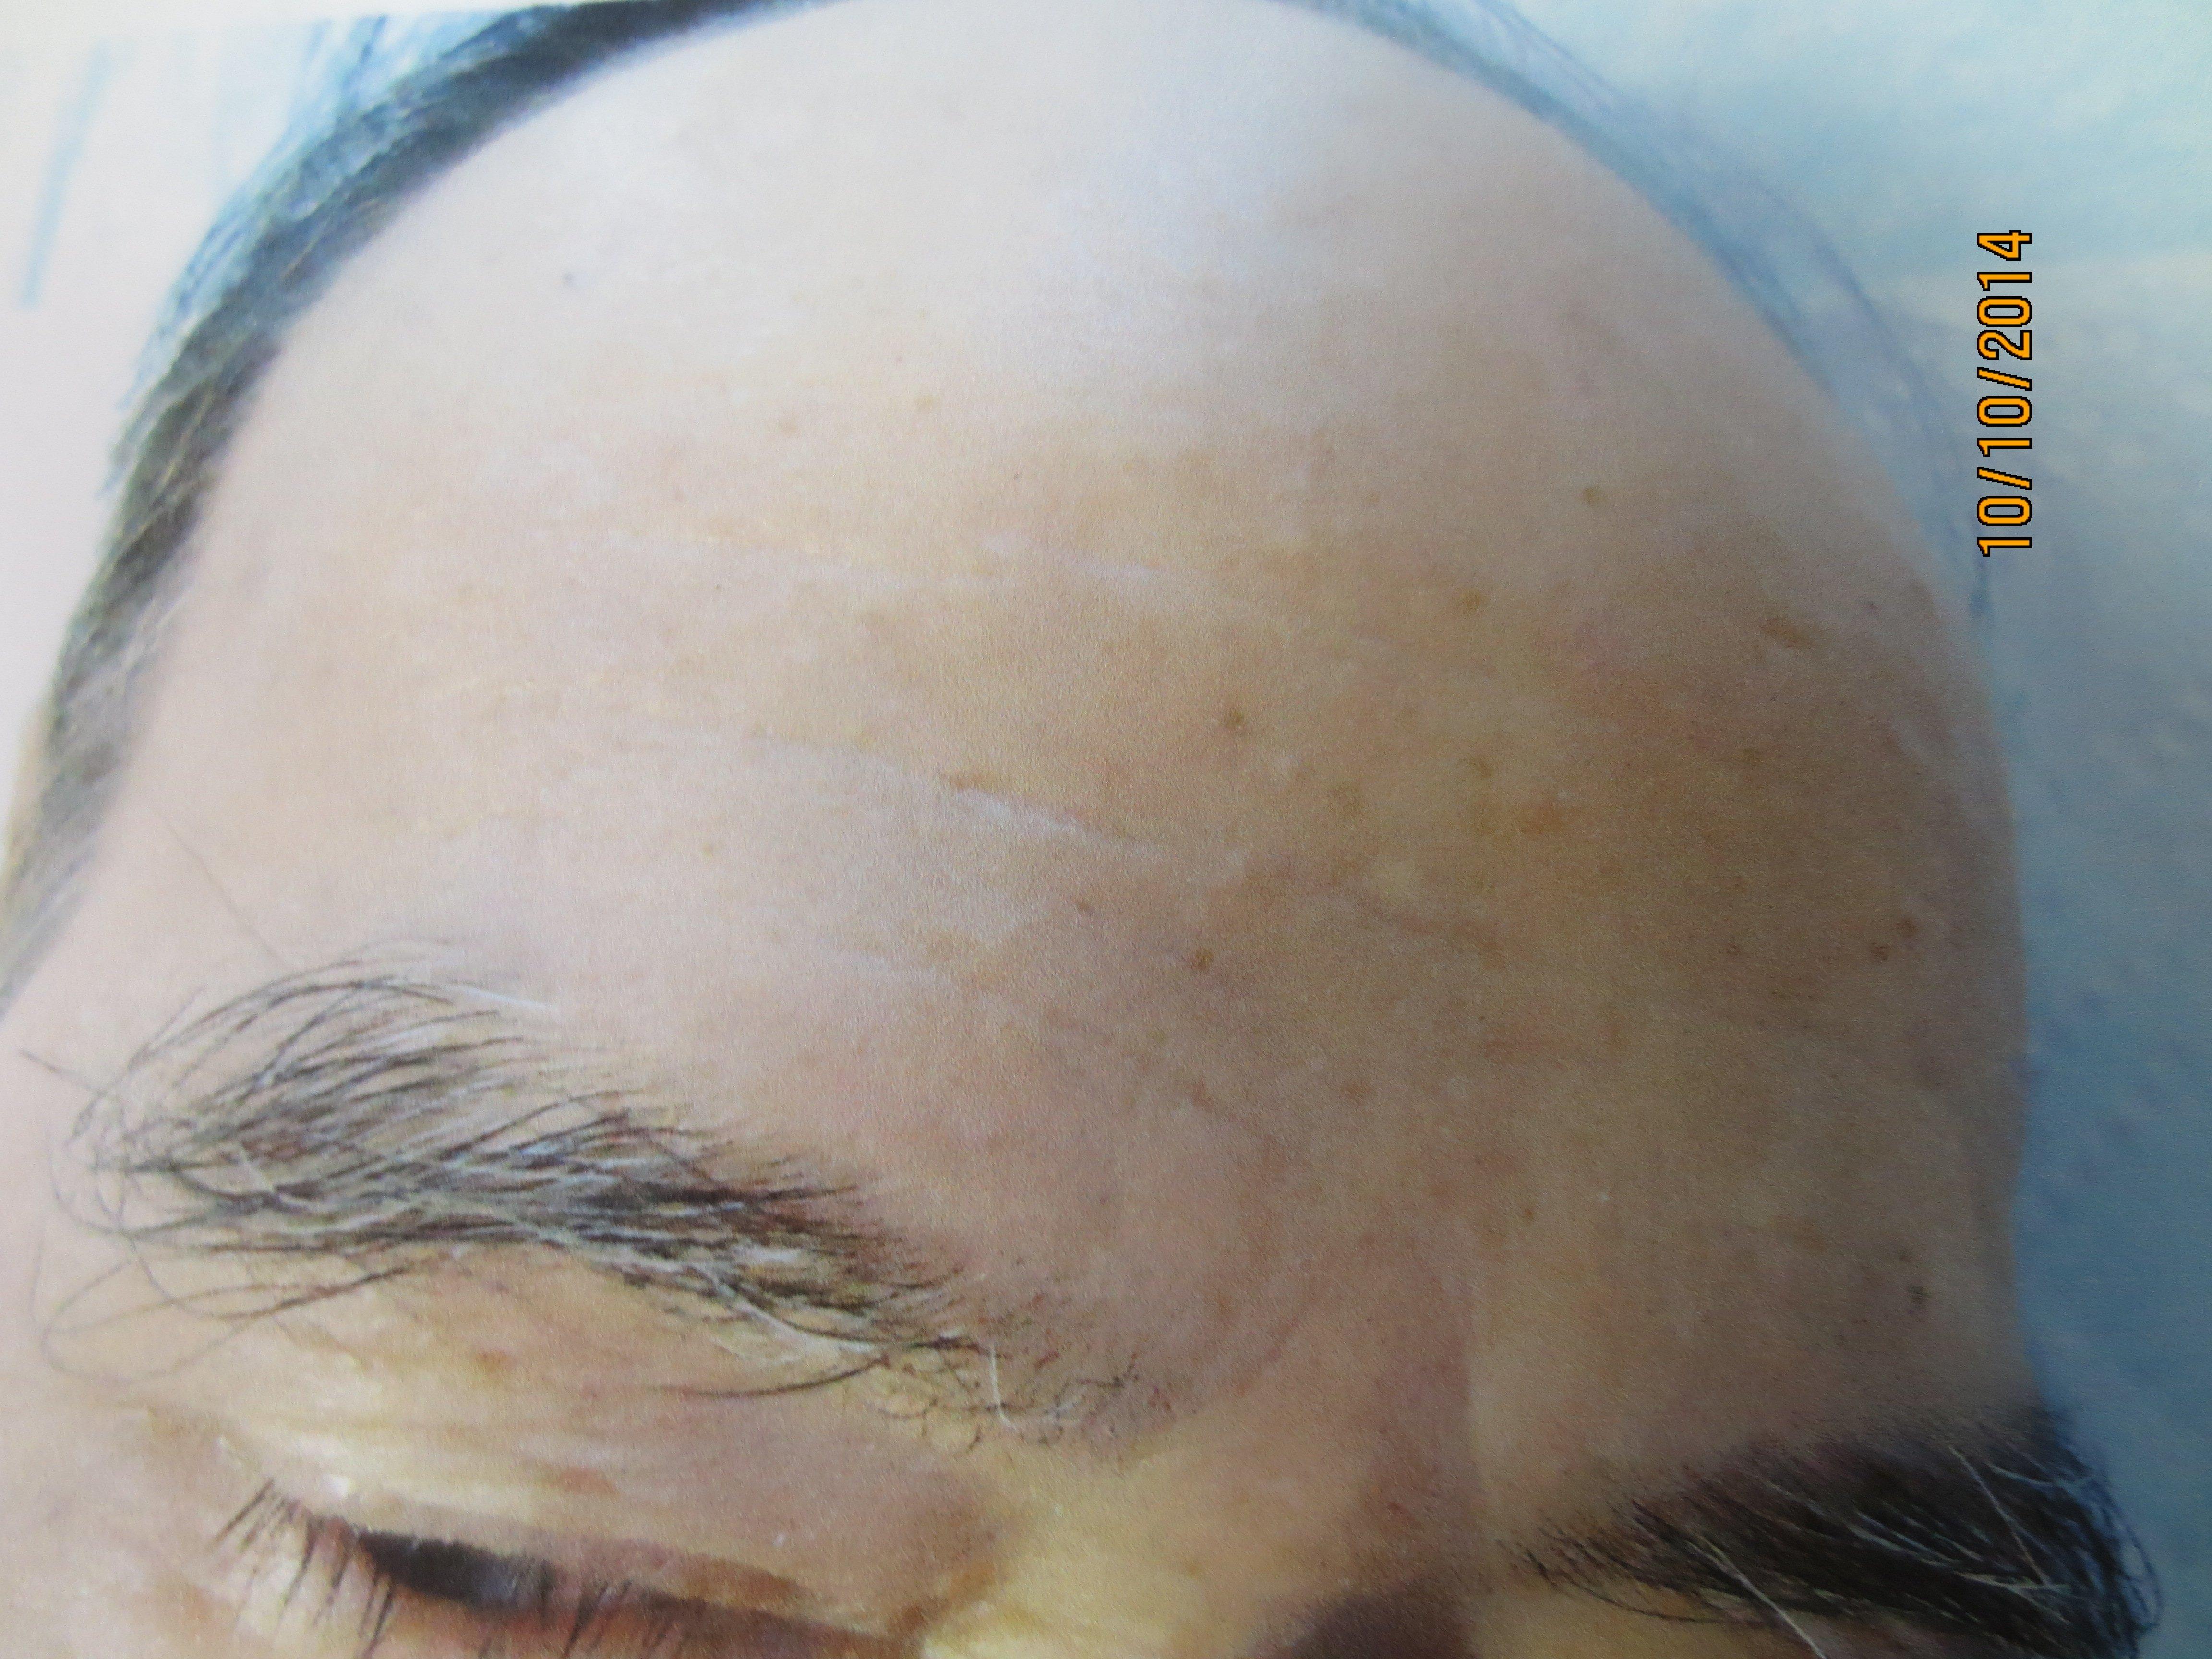 age spot removal, dark spot removal, sun spot removal, mole removal